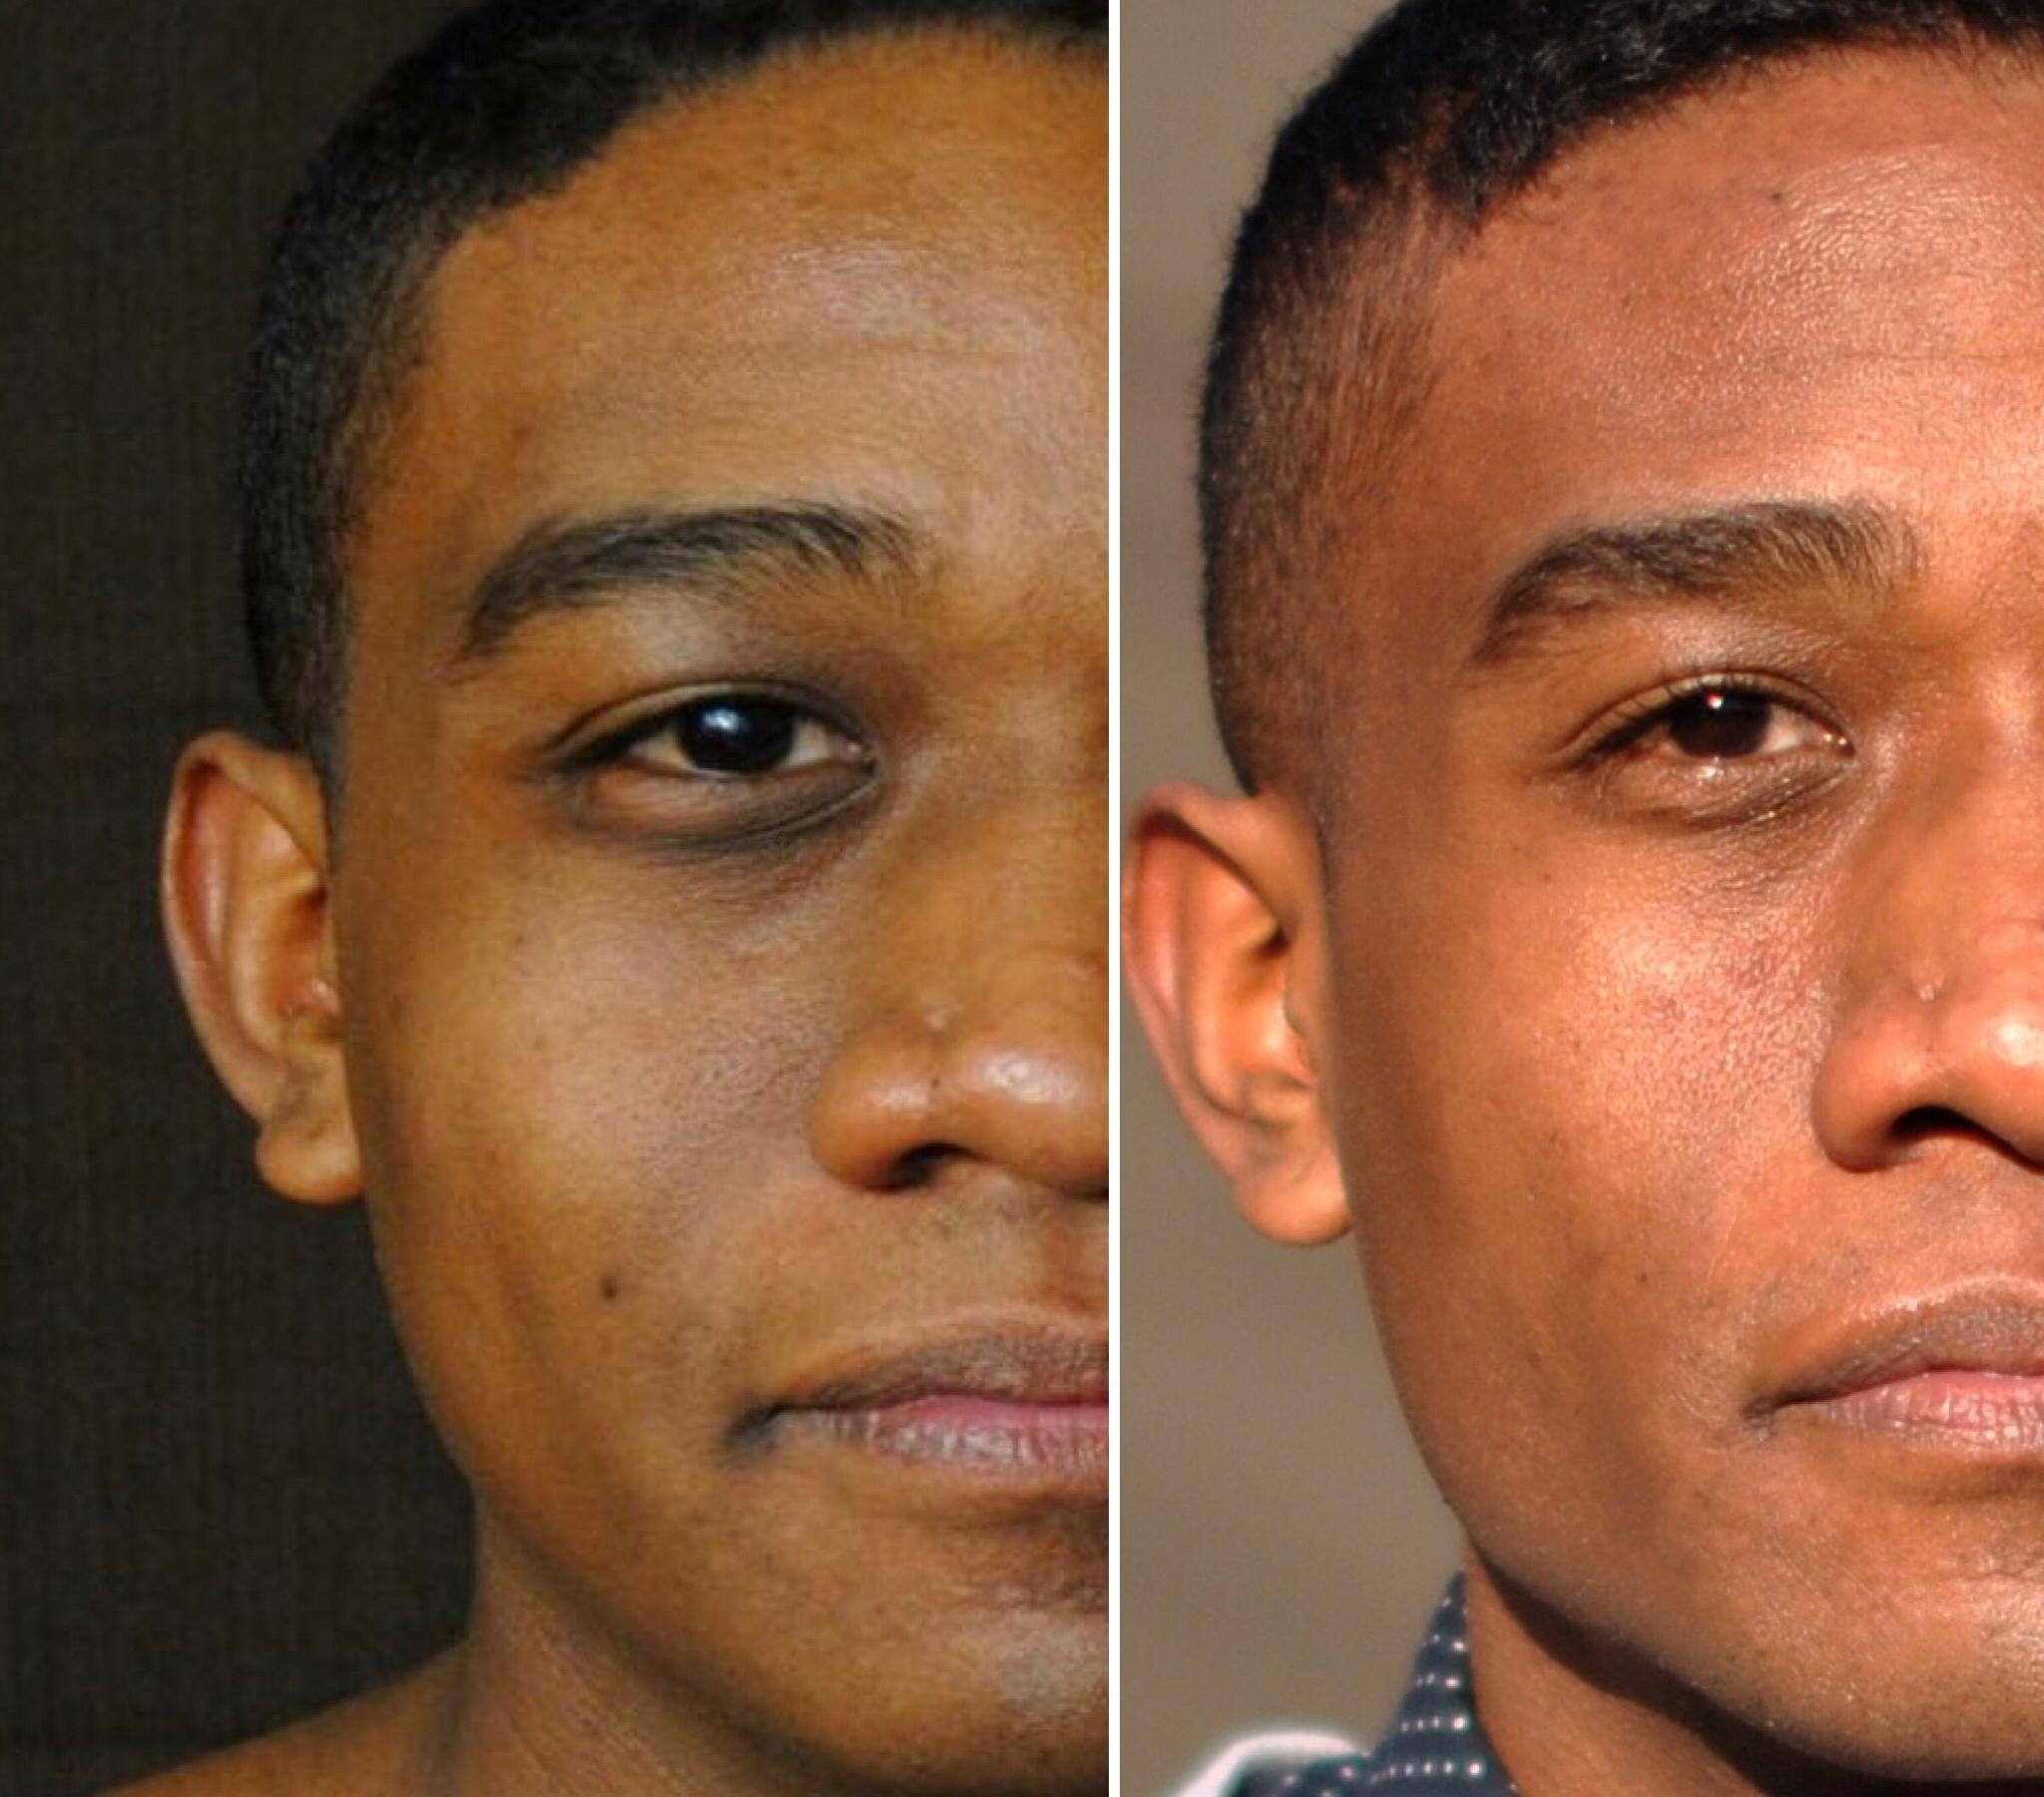 Left: Age 24 // Right: Age 29